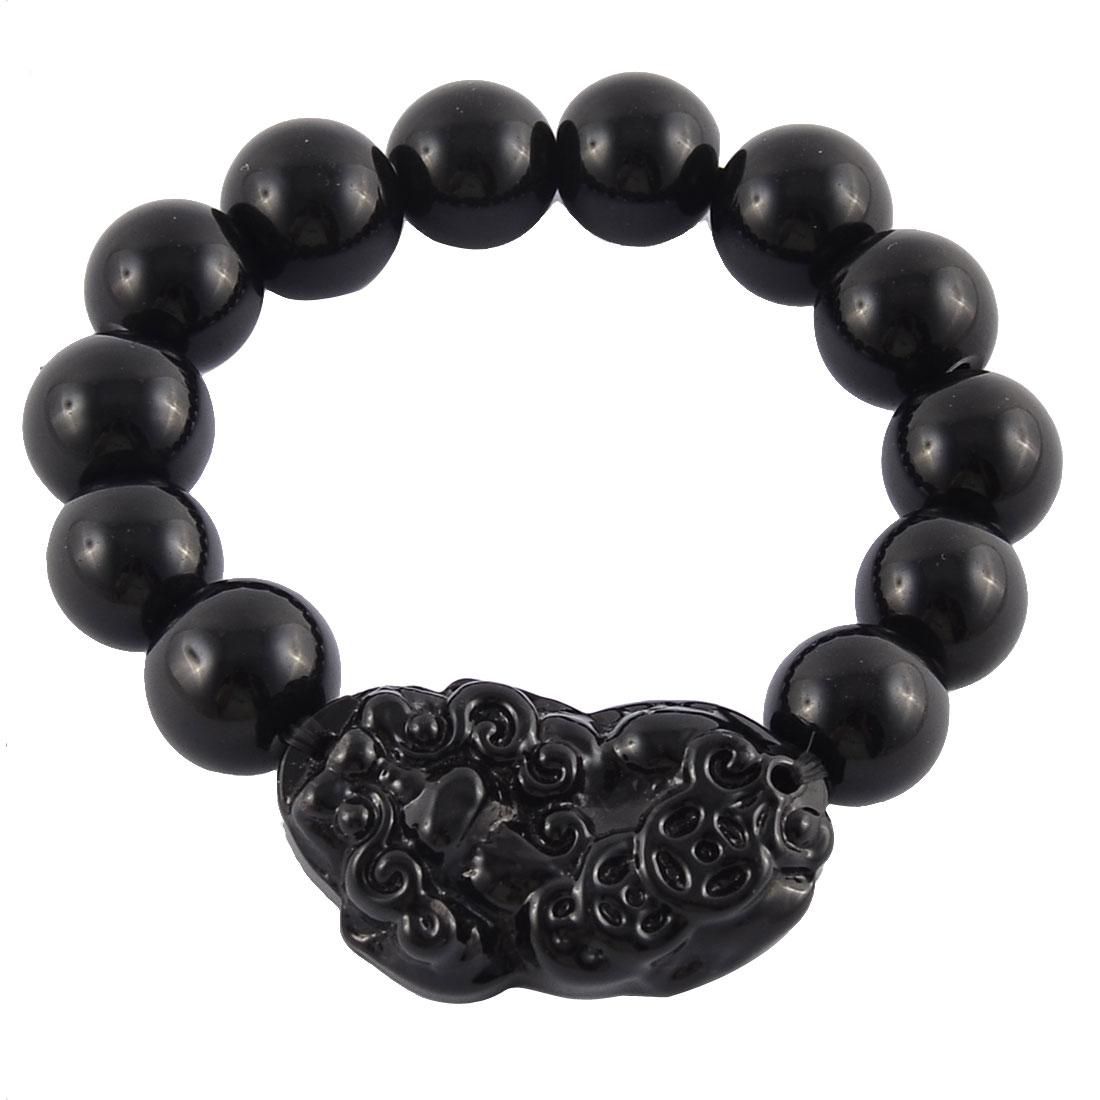 Chinese Lucky Animal Hikyuu Pendant Round Synthetic Bead Bracelet Black